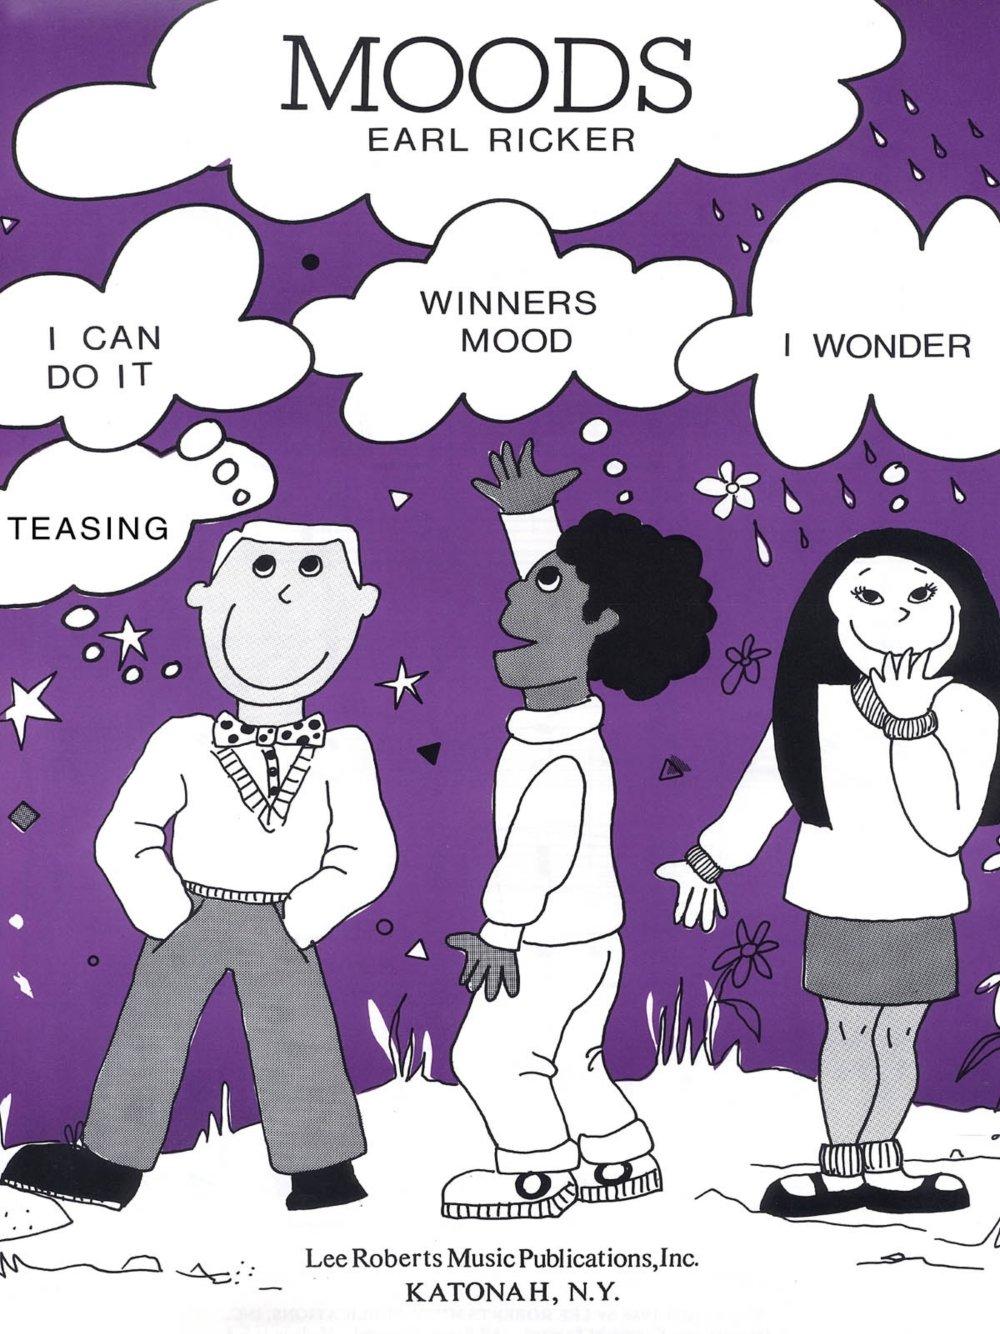 Lee Roberts Moods - Levels II-III, (Teasing, I Wonder, I Can Do It, Winner's Mood) Pace Piano by Earl Ricker ebook